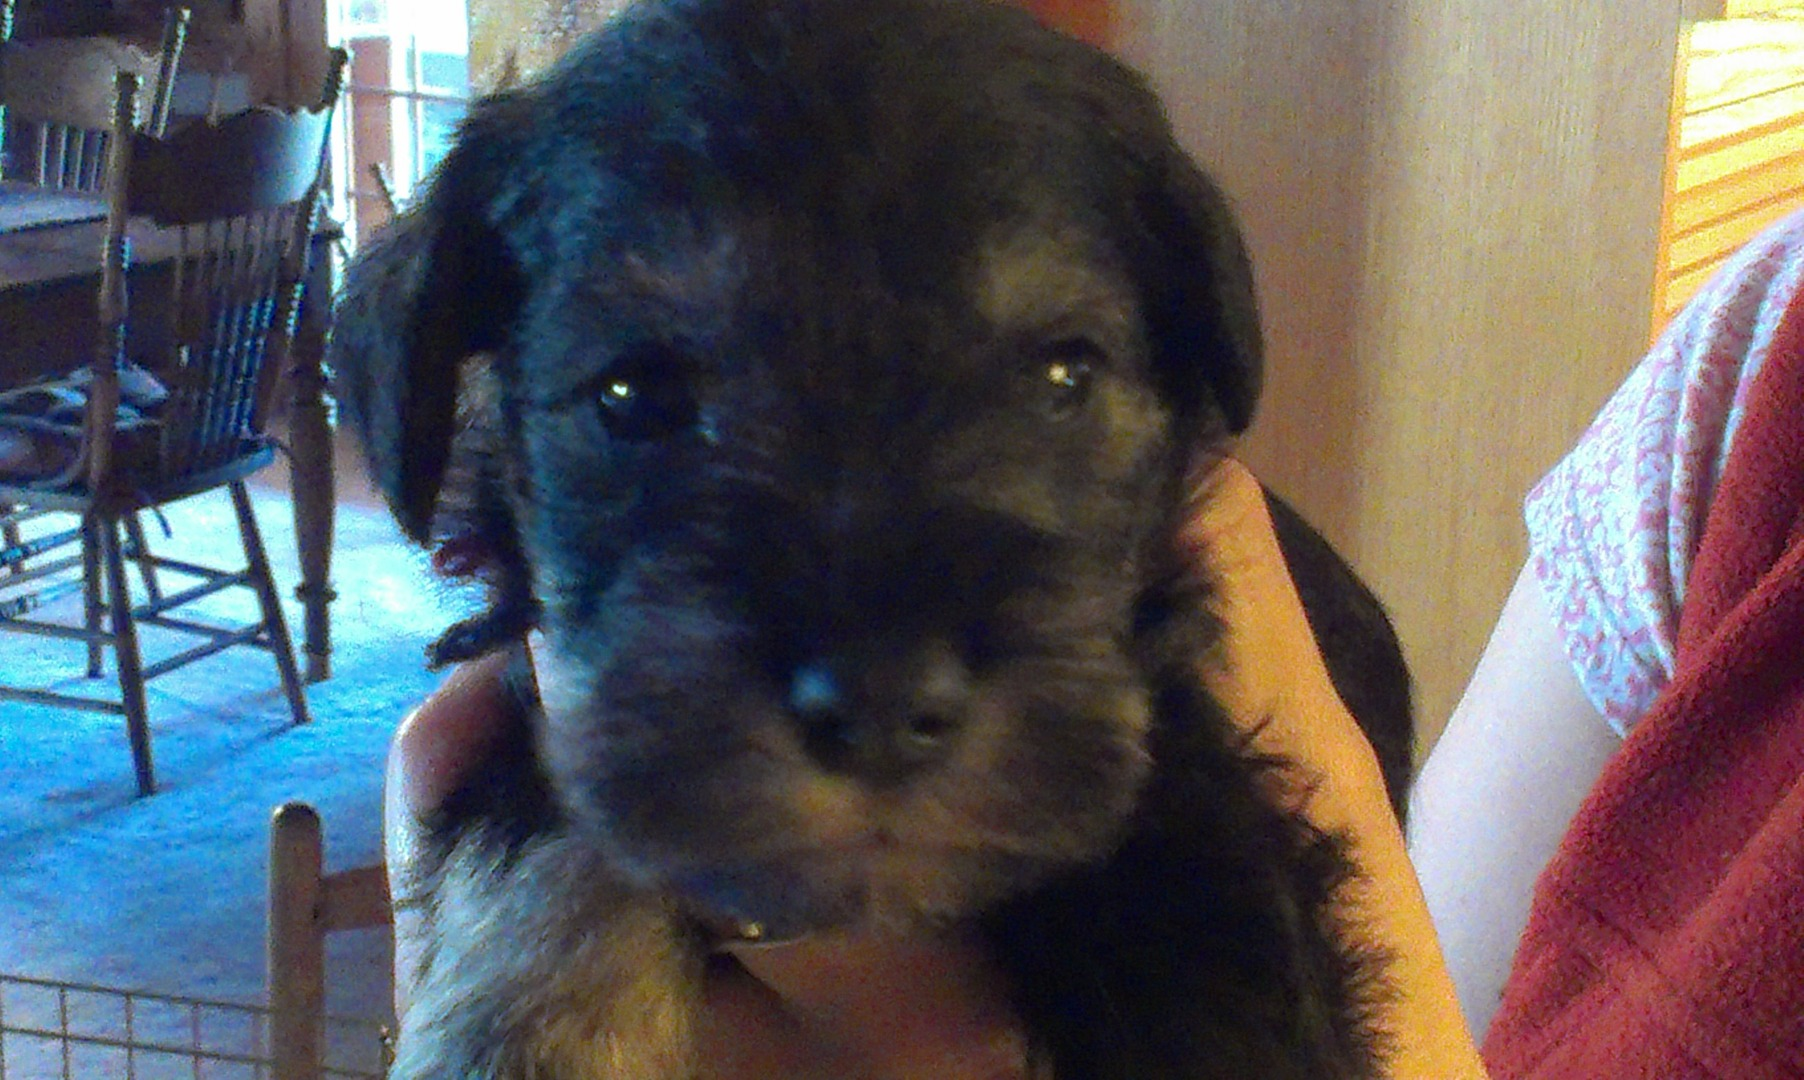 Lexi's baby Bella